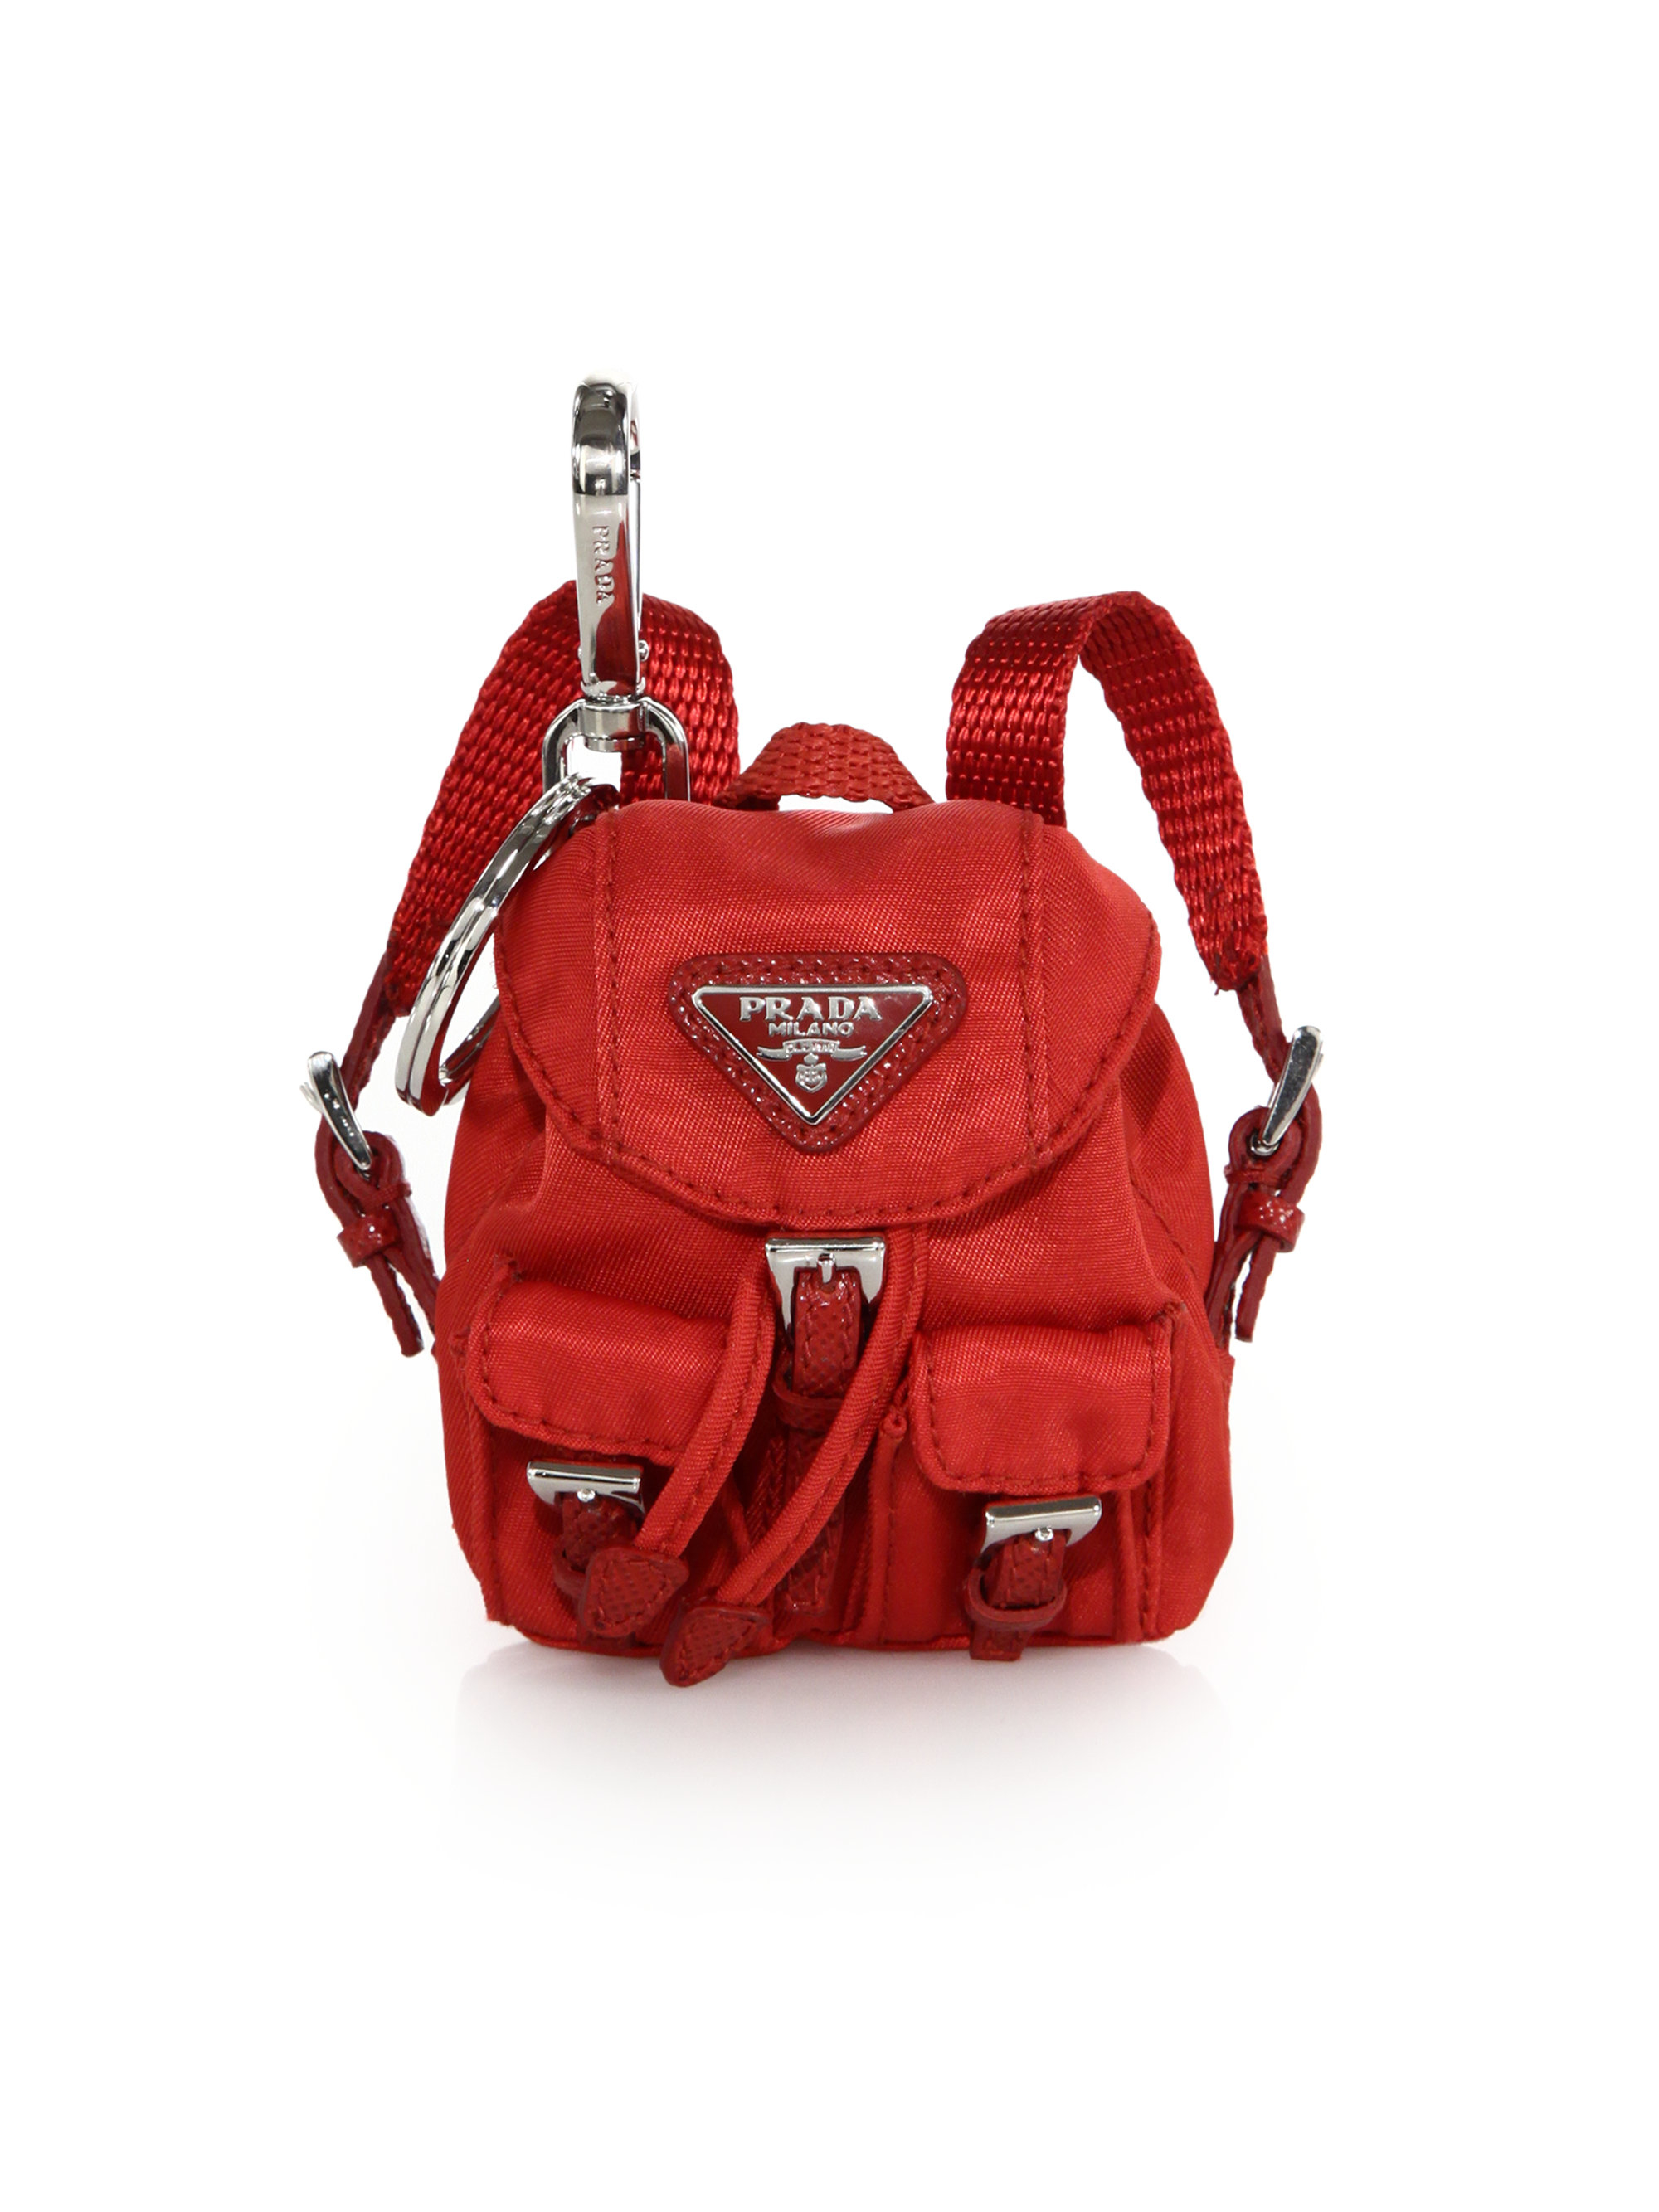 91342df22dfa Lyst - Prada Vela Backpack Keychain in Red